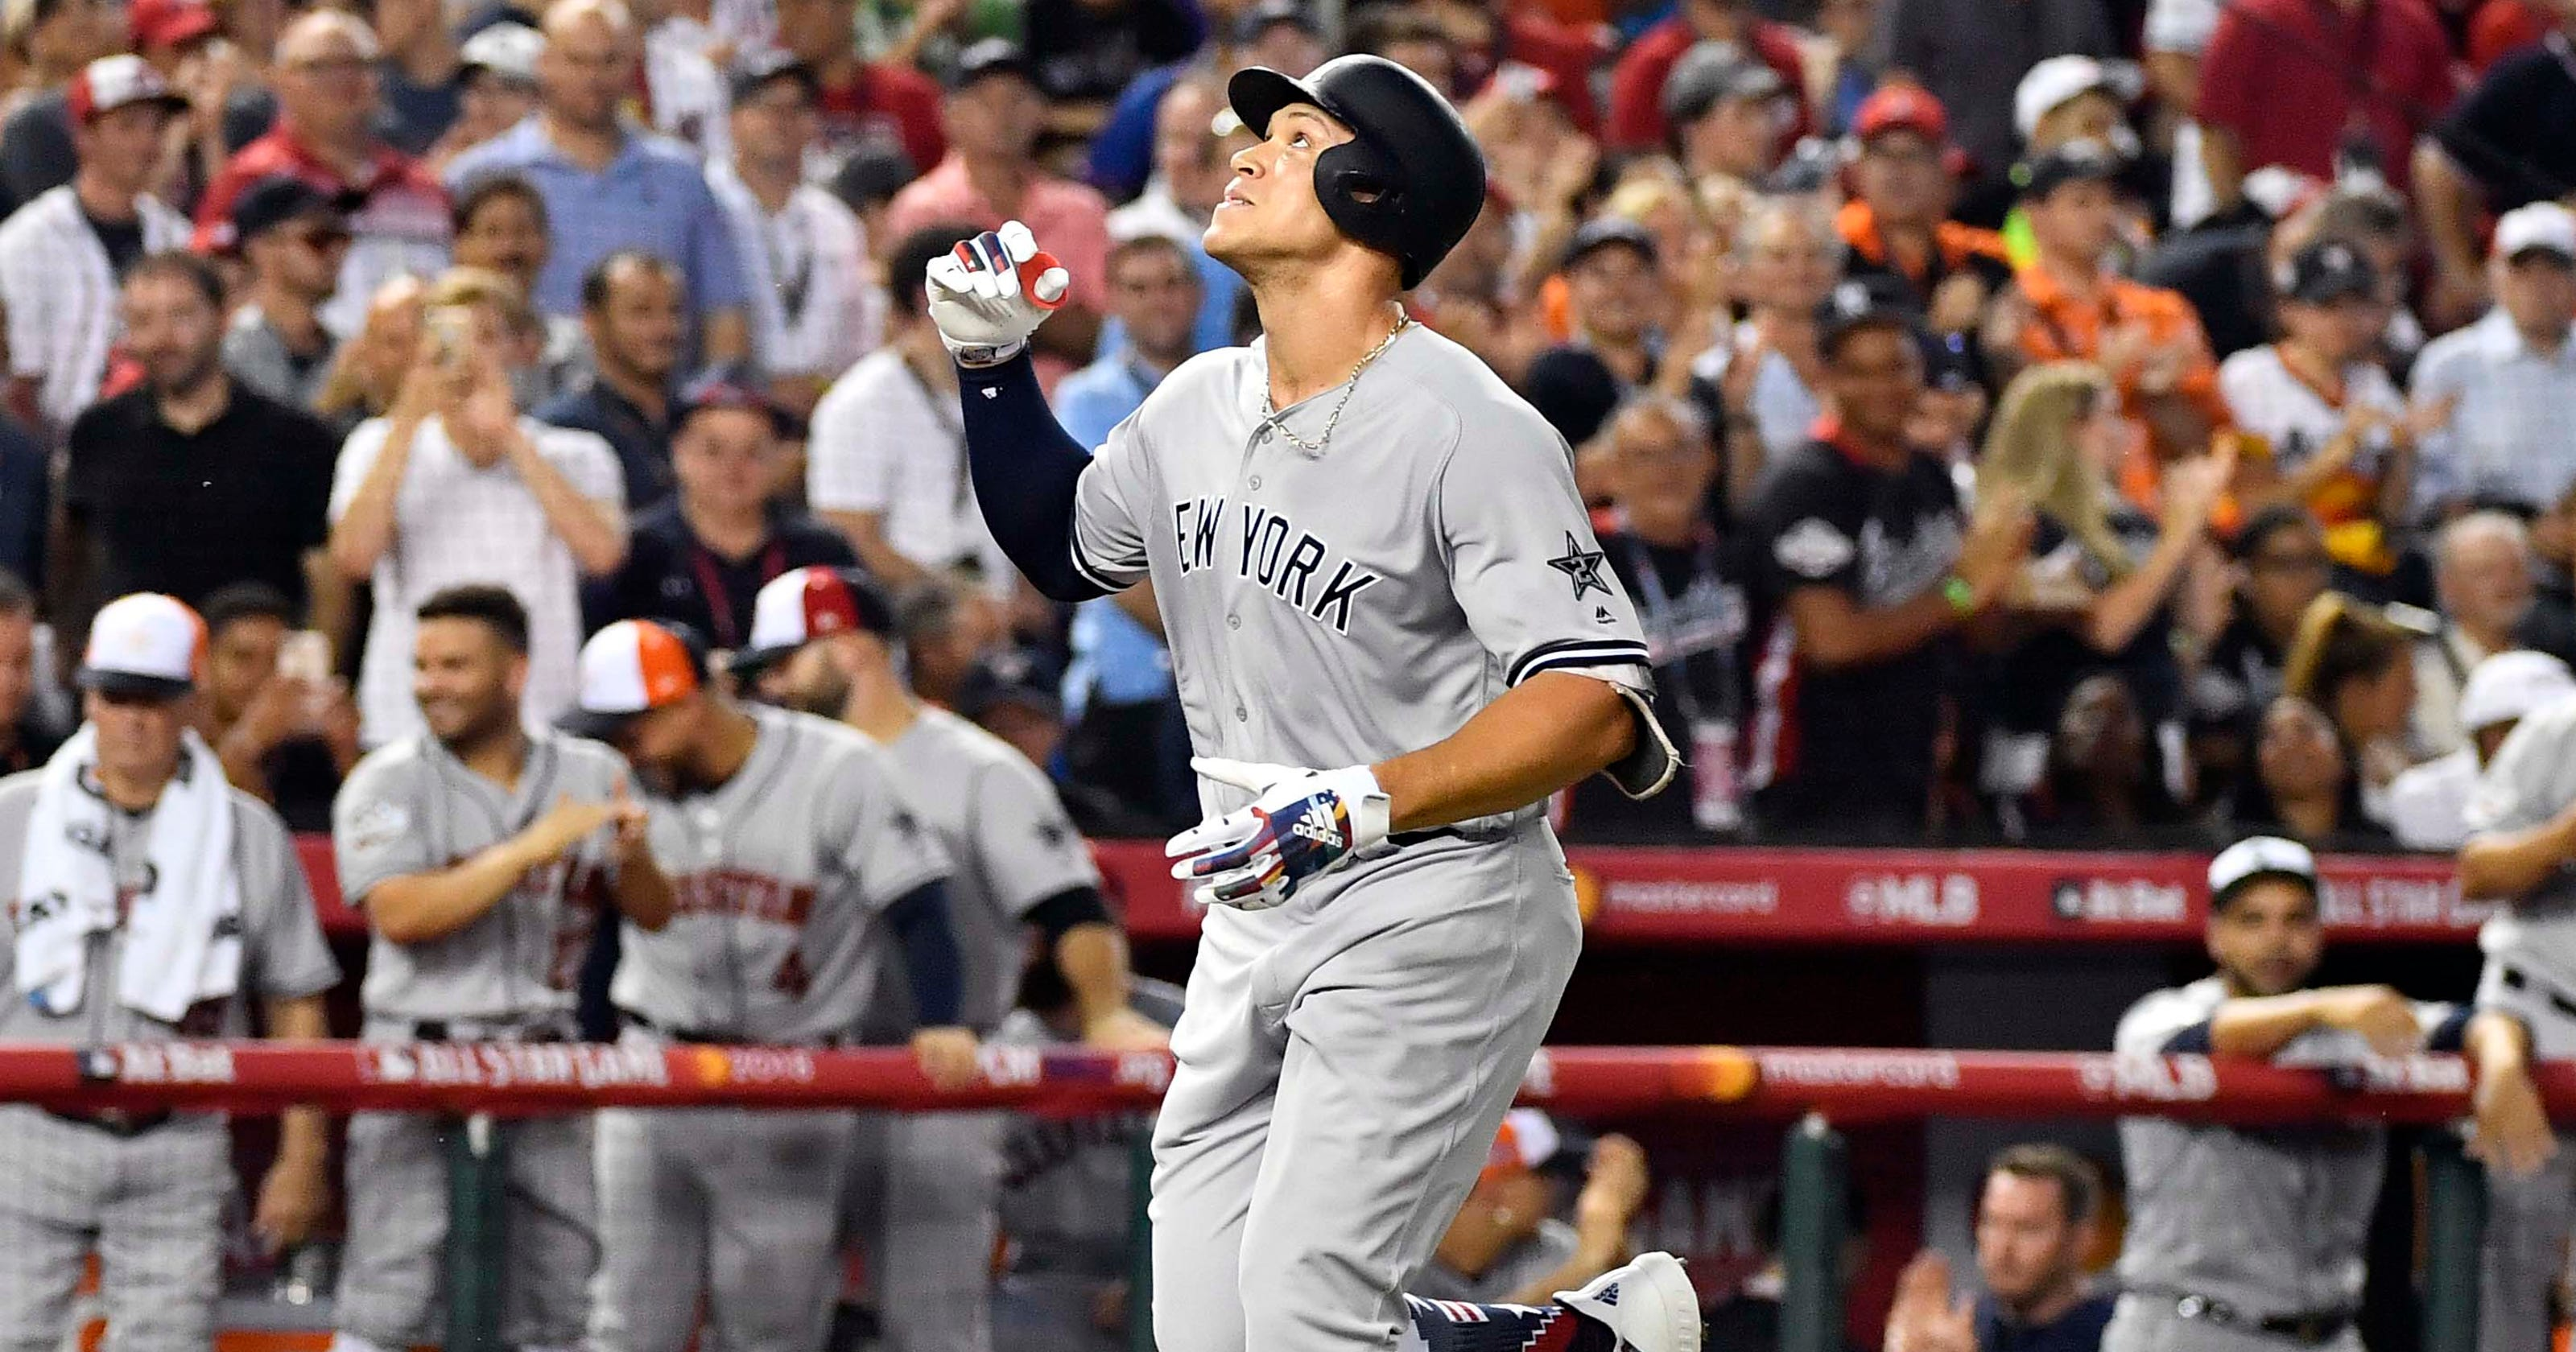 aa6b46b2c9c Aaron Judge cranks HR at MLB All-Star Game off of Max Scherzer